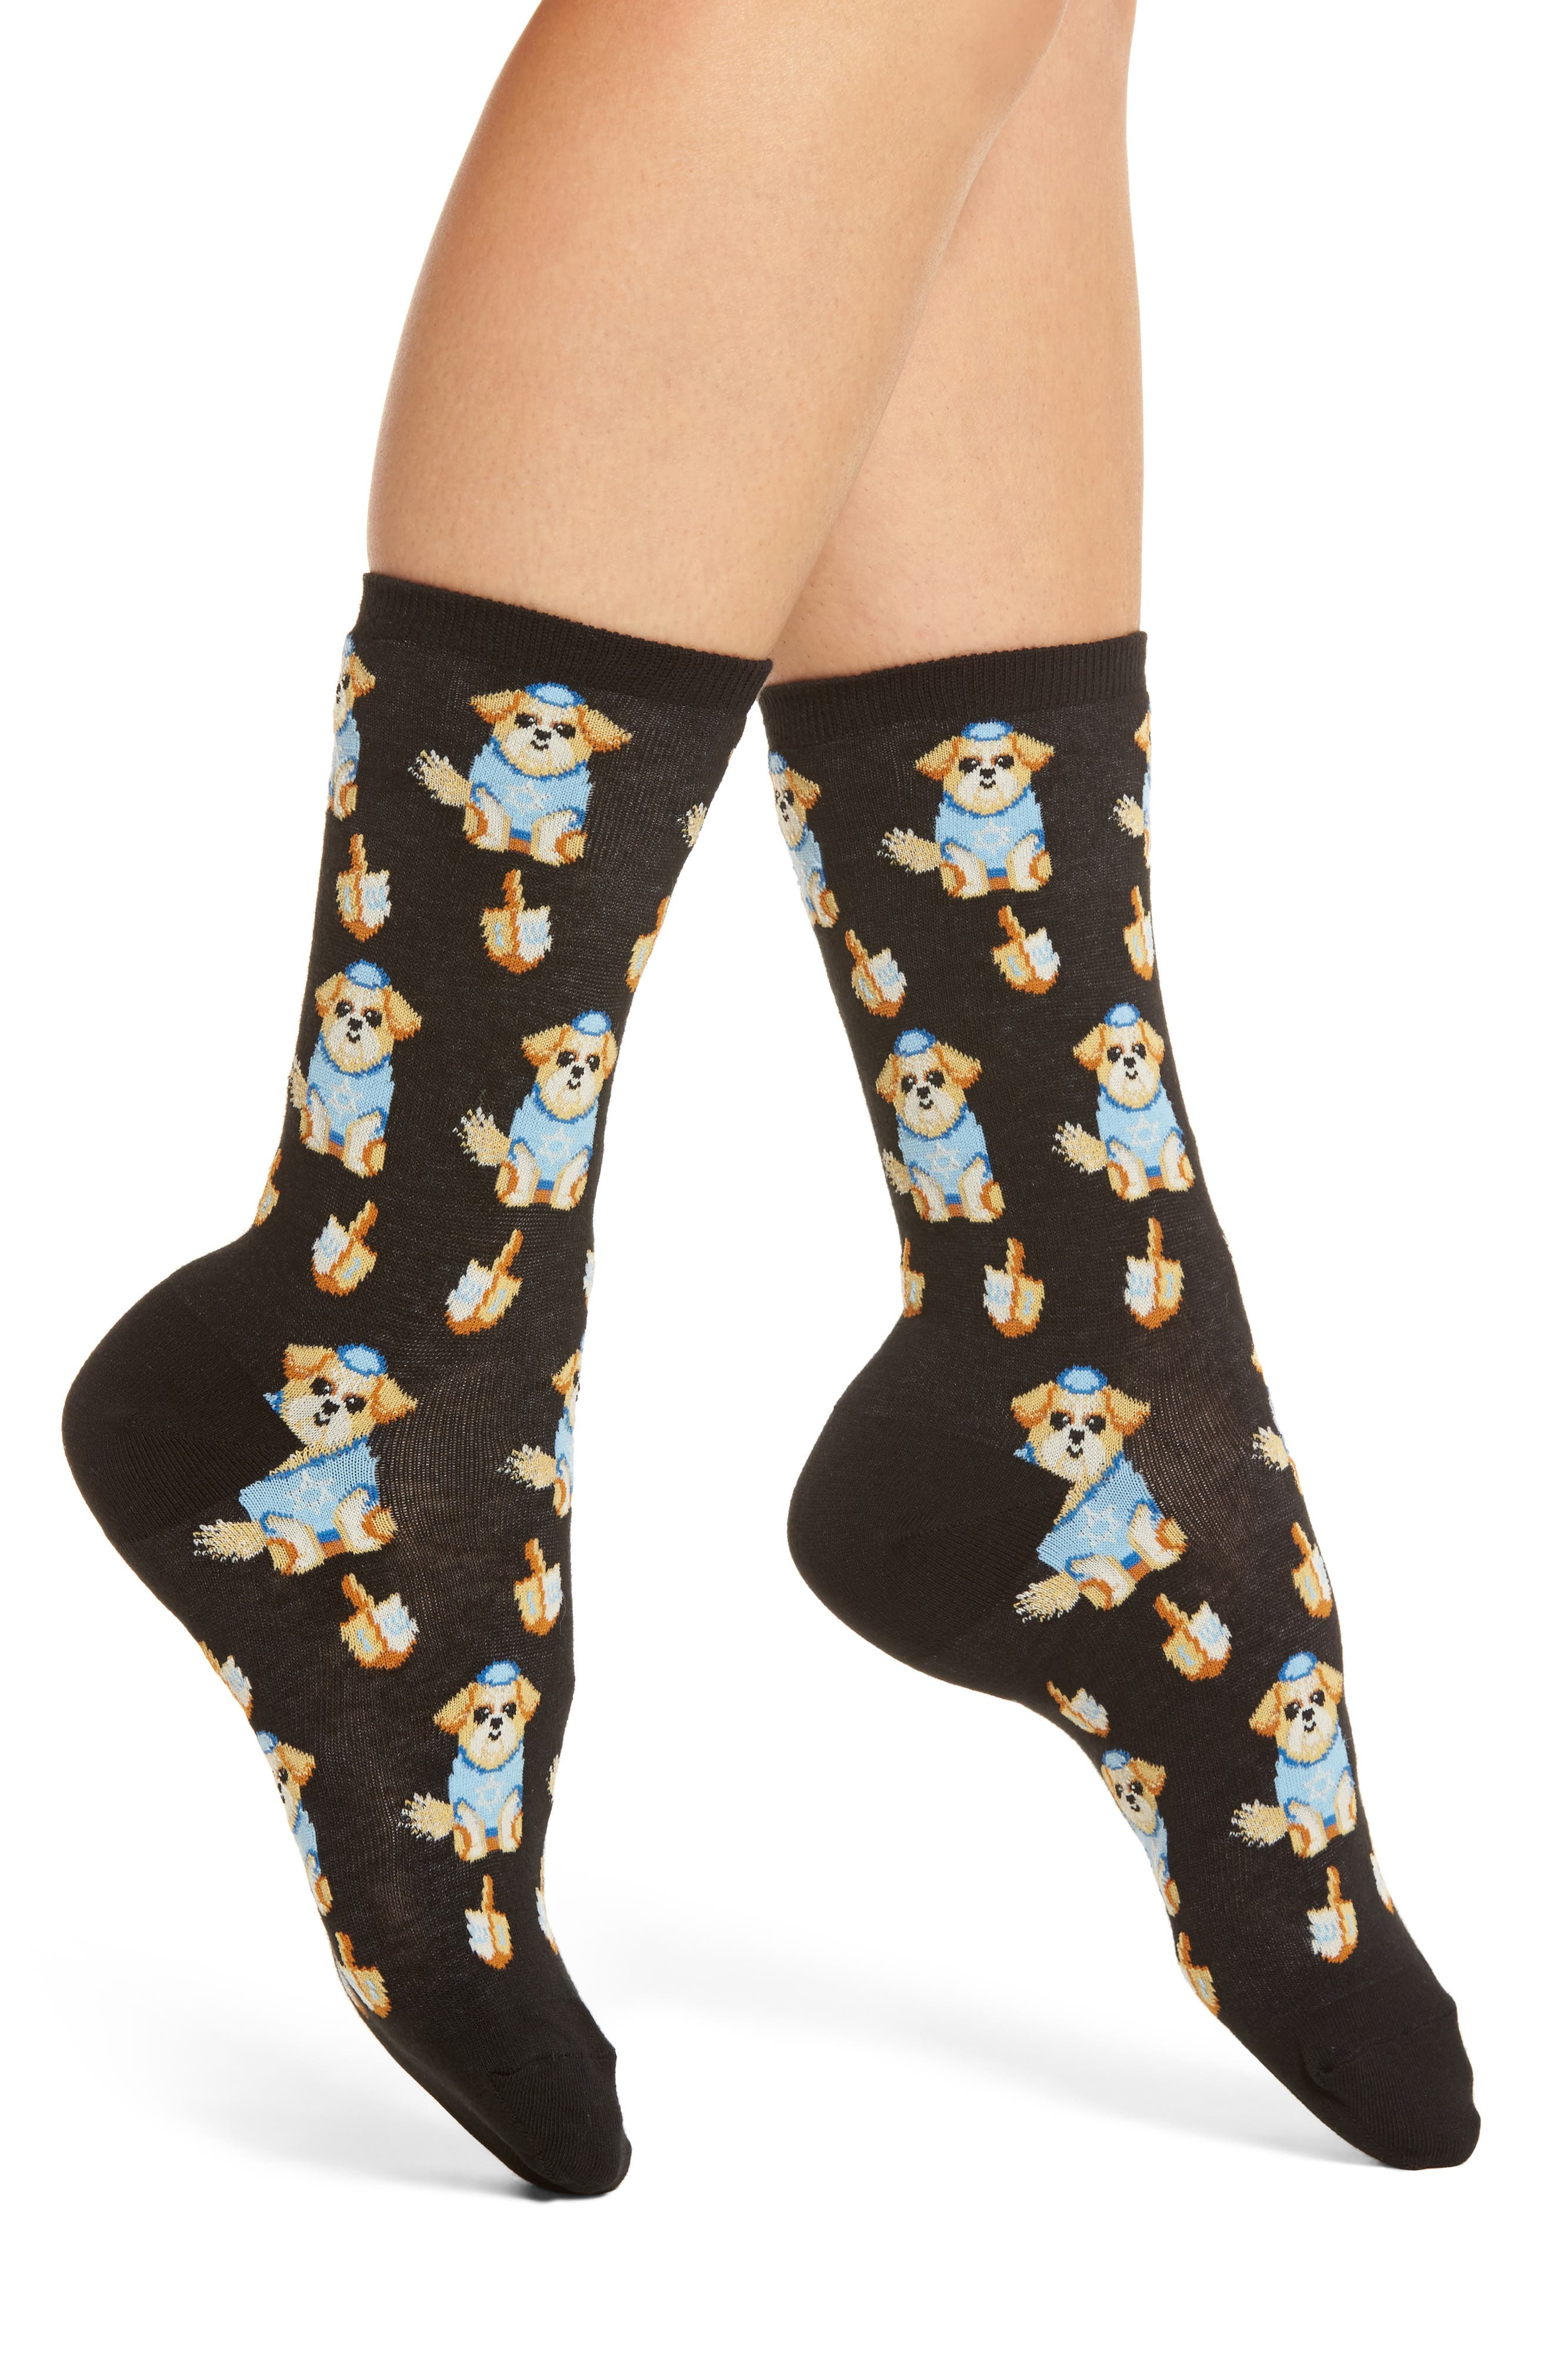 Hot Sox Dreidel Dog Crew Socks (3 for $15)